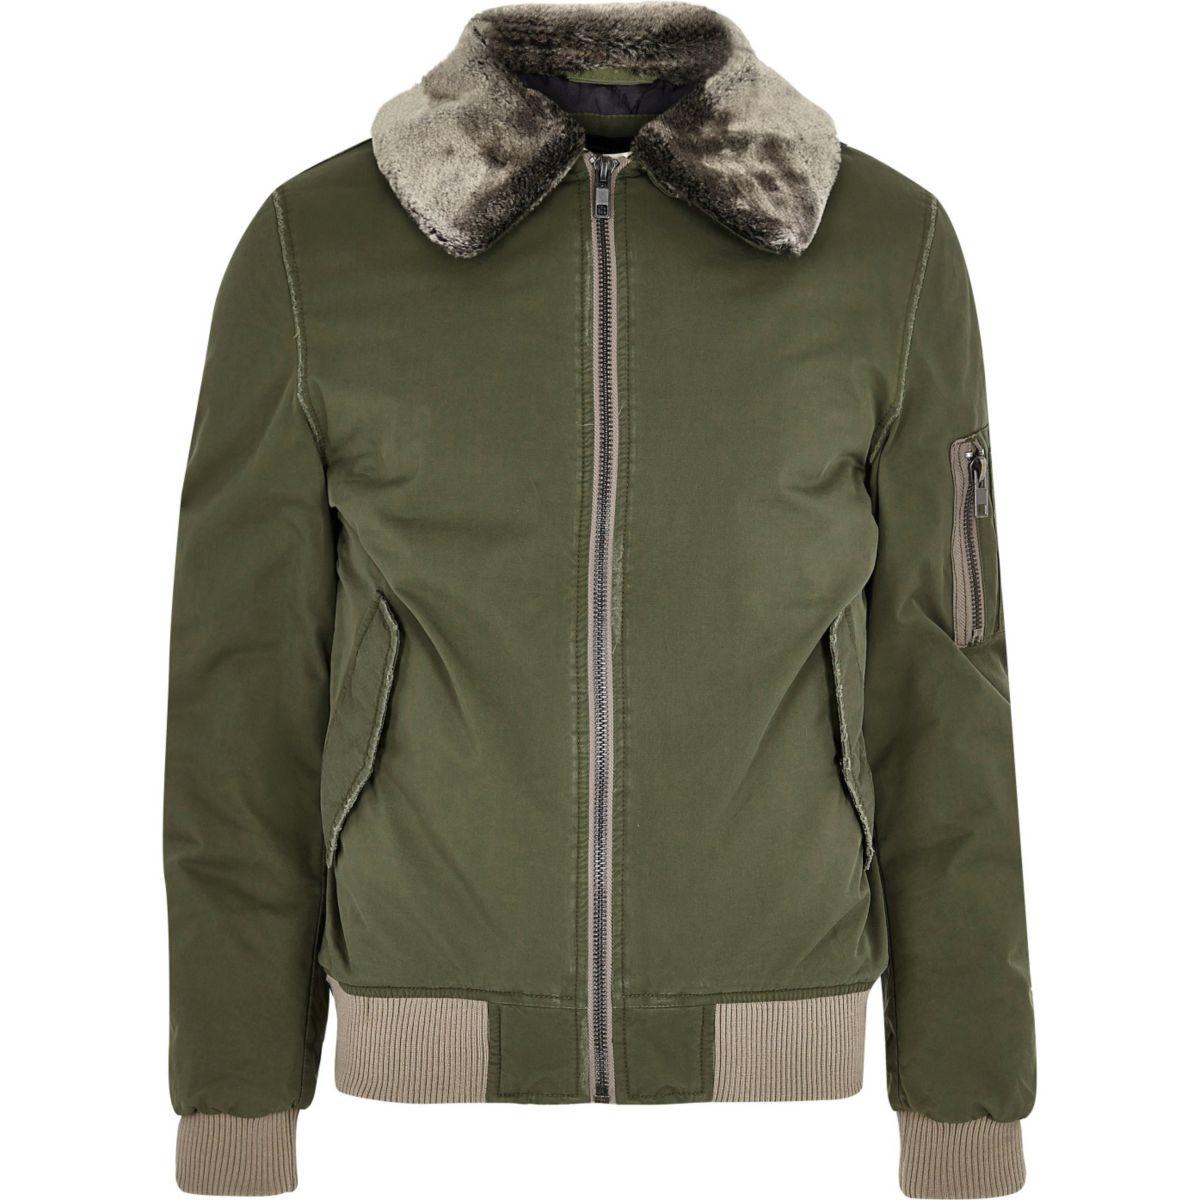 Khaki green faux fur collar aviator jacket